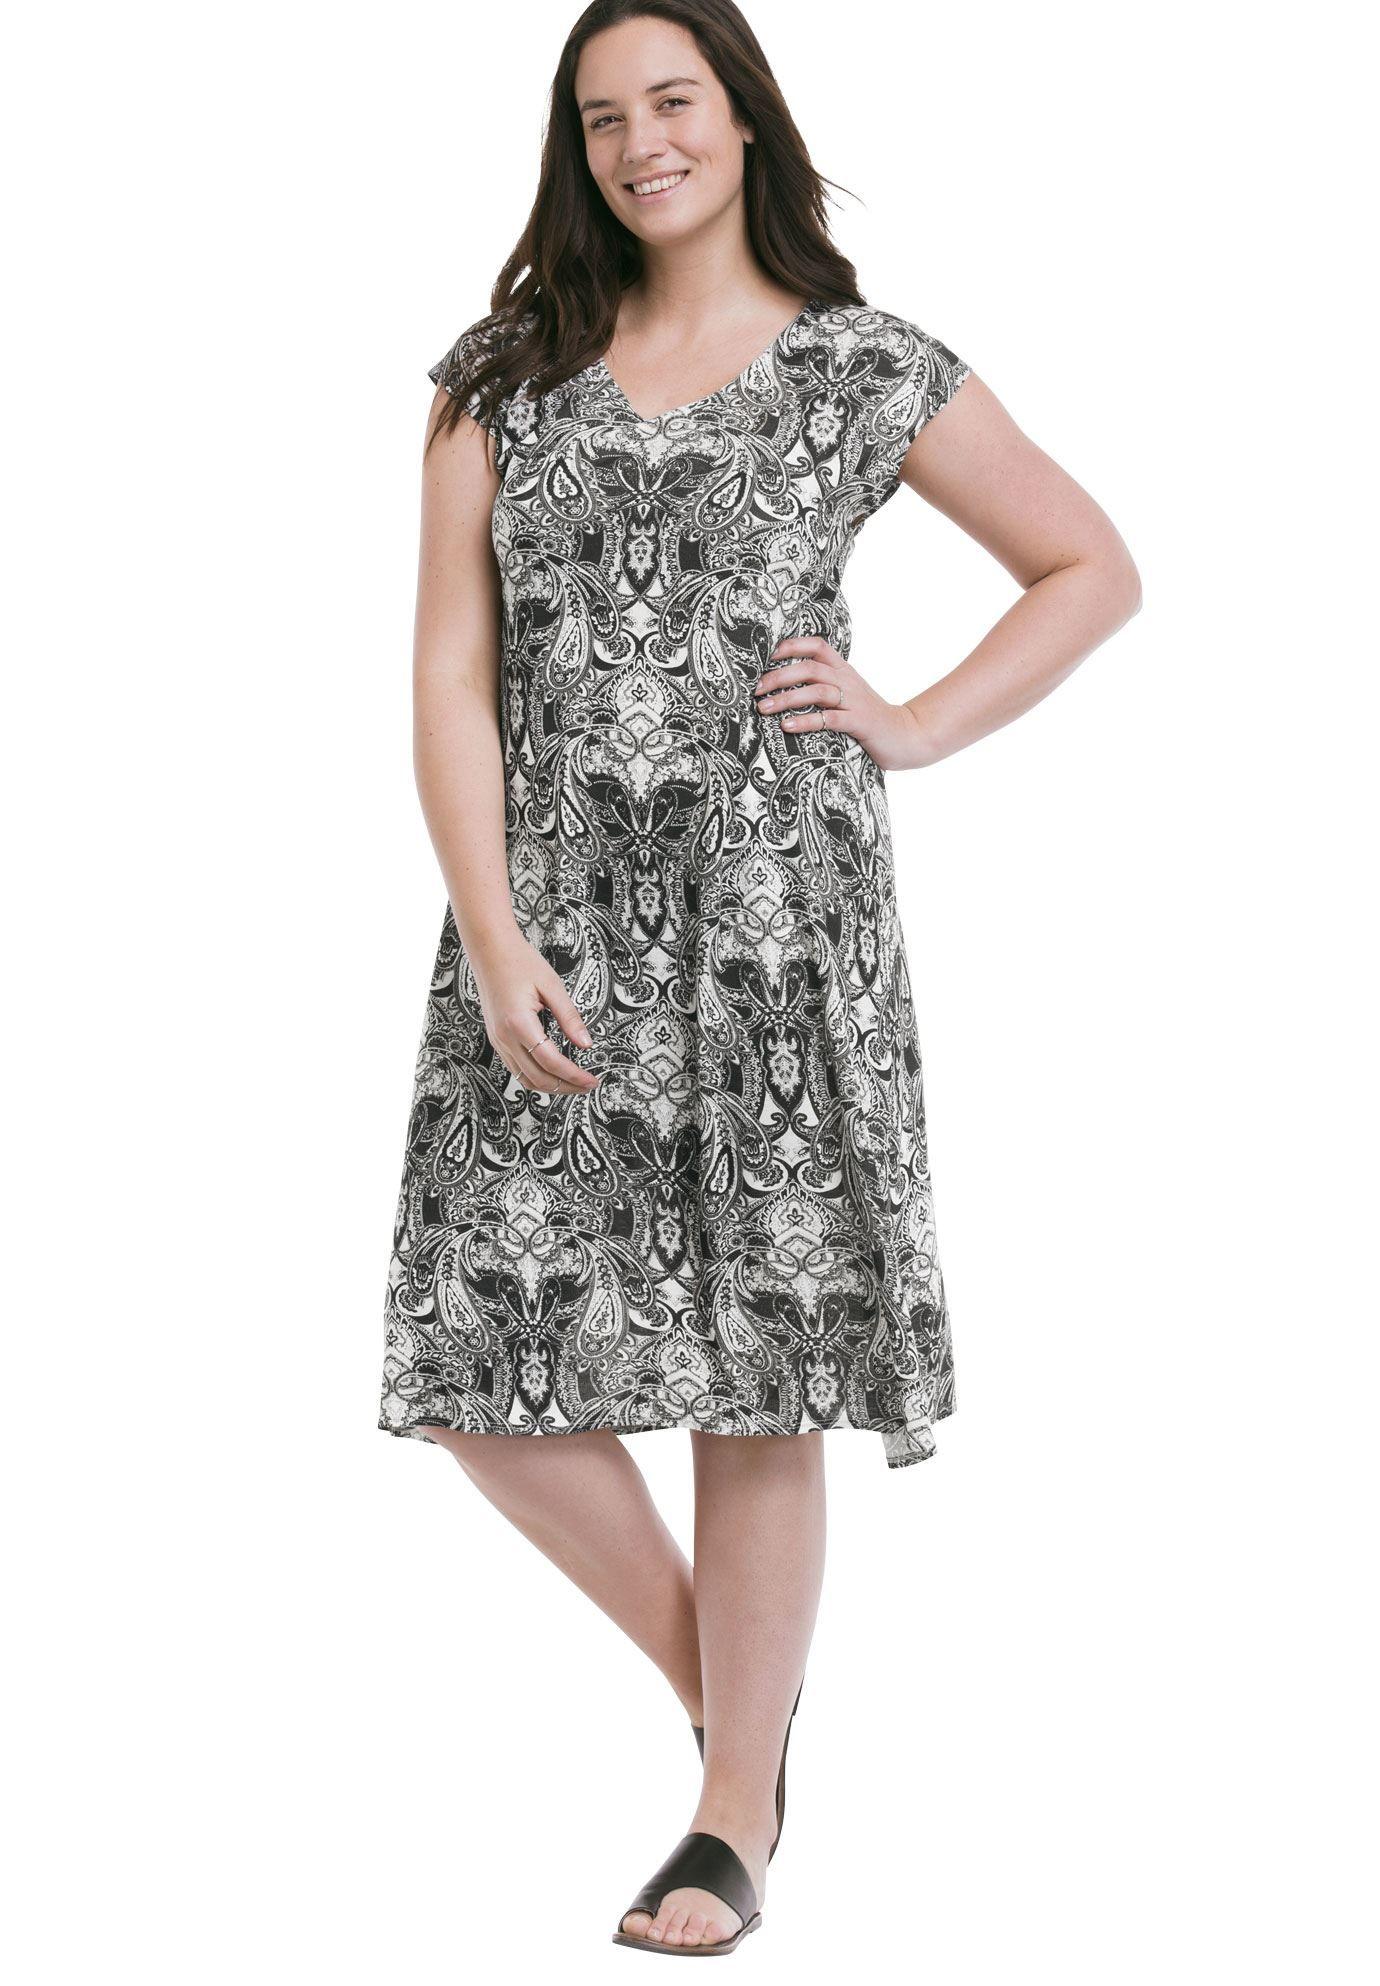 04ab28e36ea0 Paisley T-Shirt Dress by Ellos® - Women's Plus Size Clothing ...